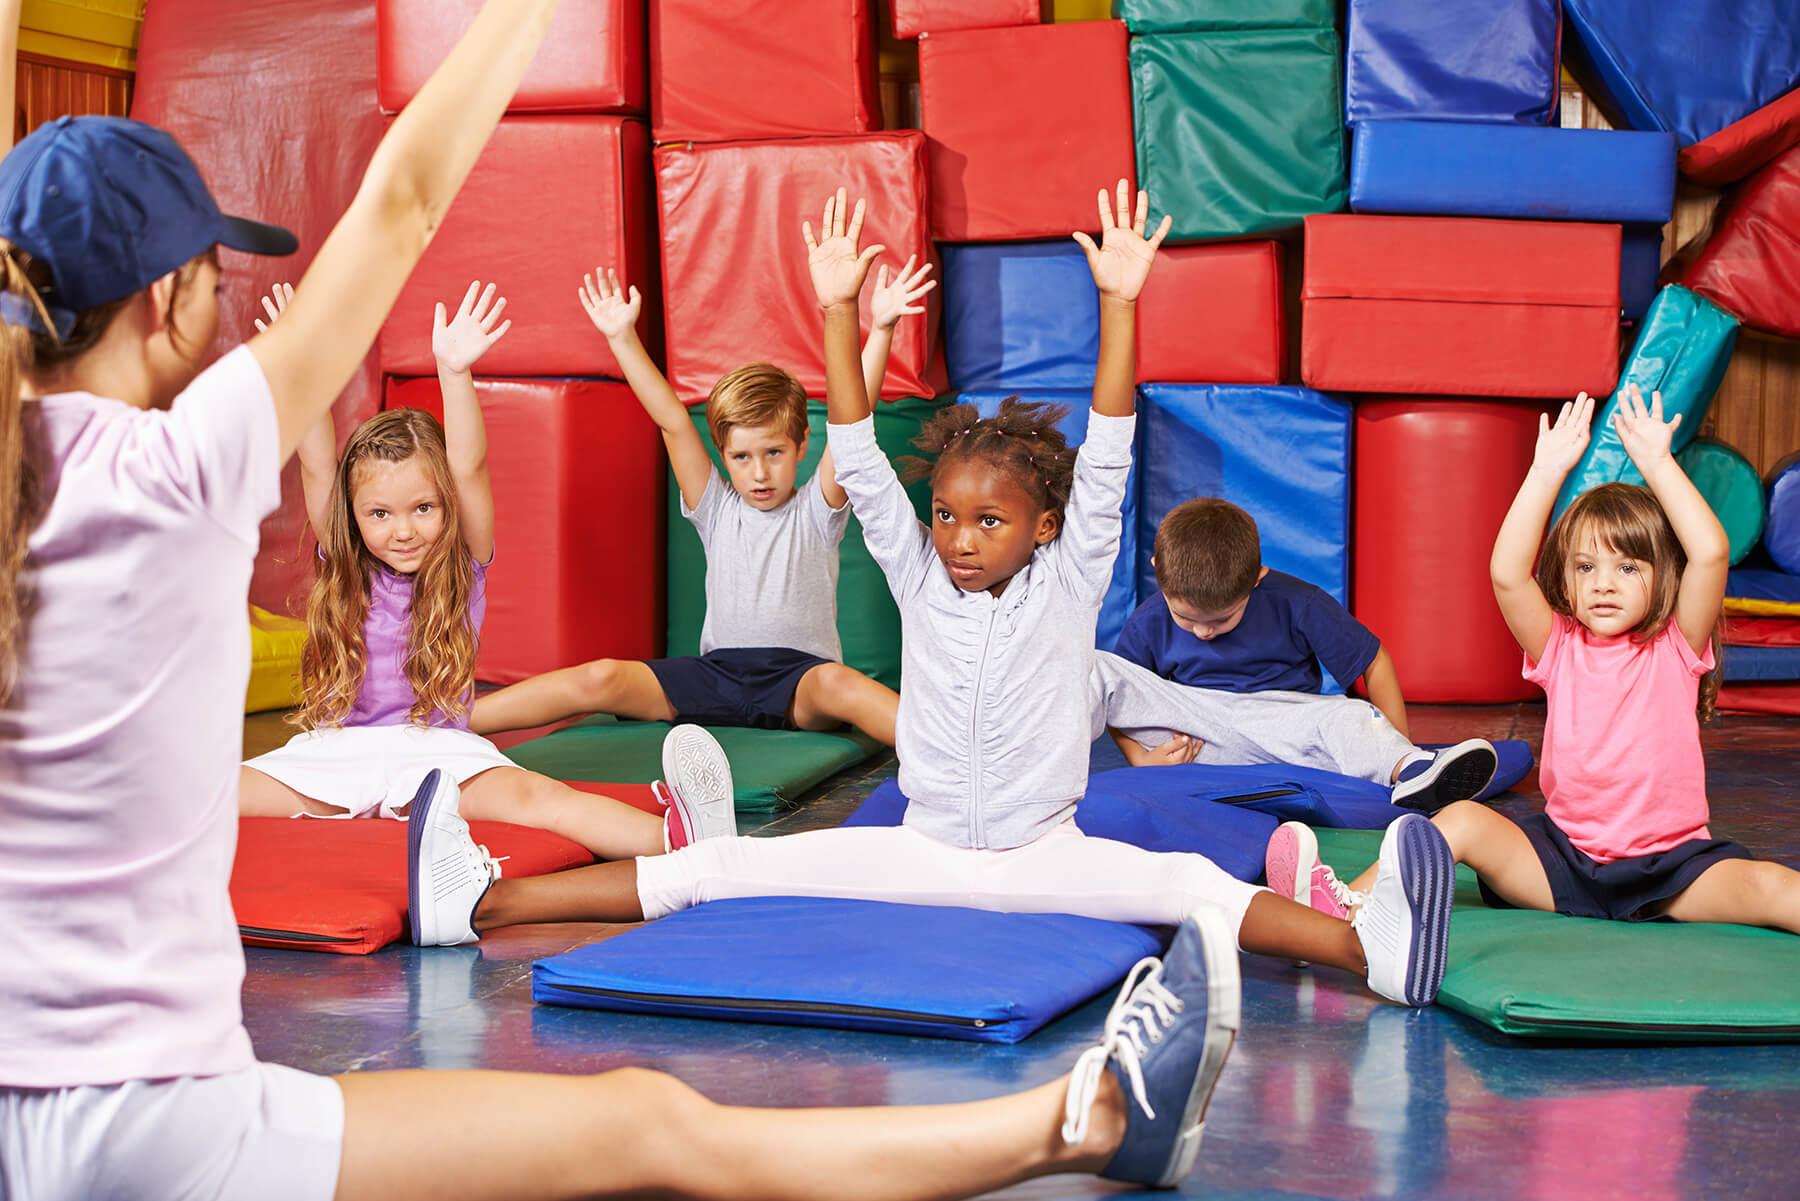 Children taking gymnastics class with instructor teaching